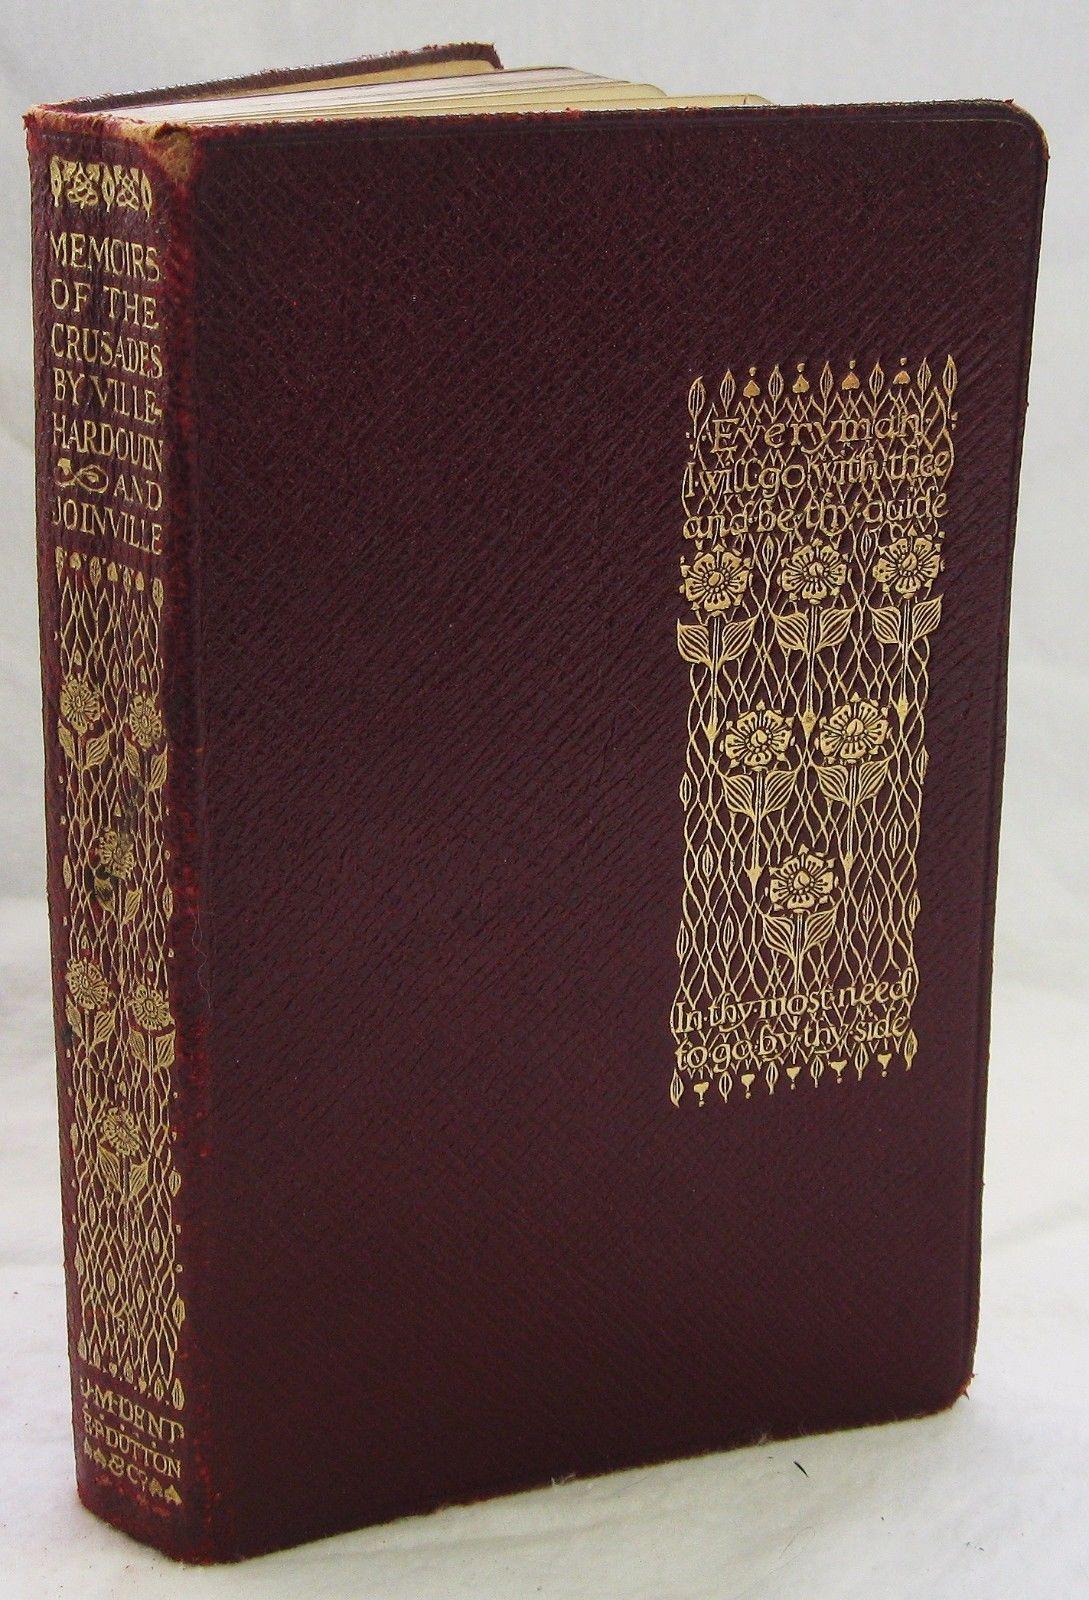 Villehardouin and De Joinville: Memoirs of the Crusades